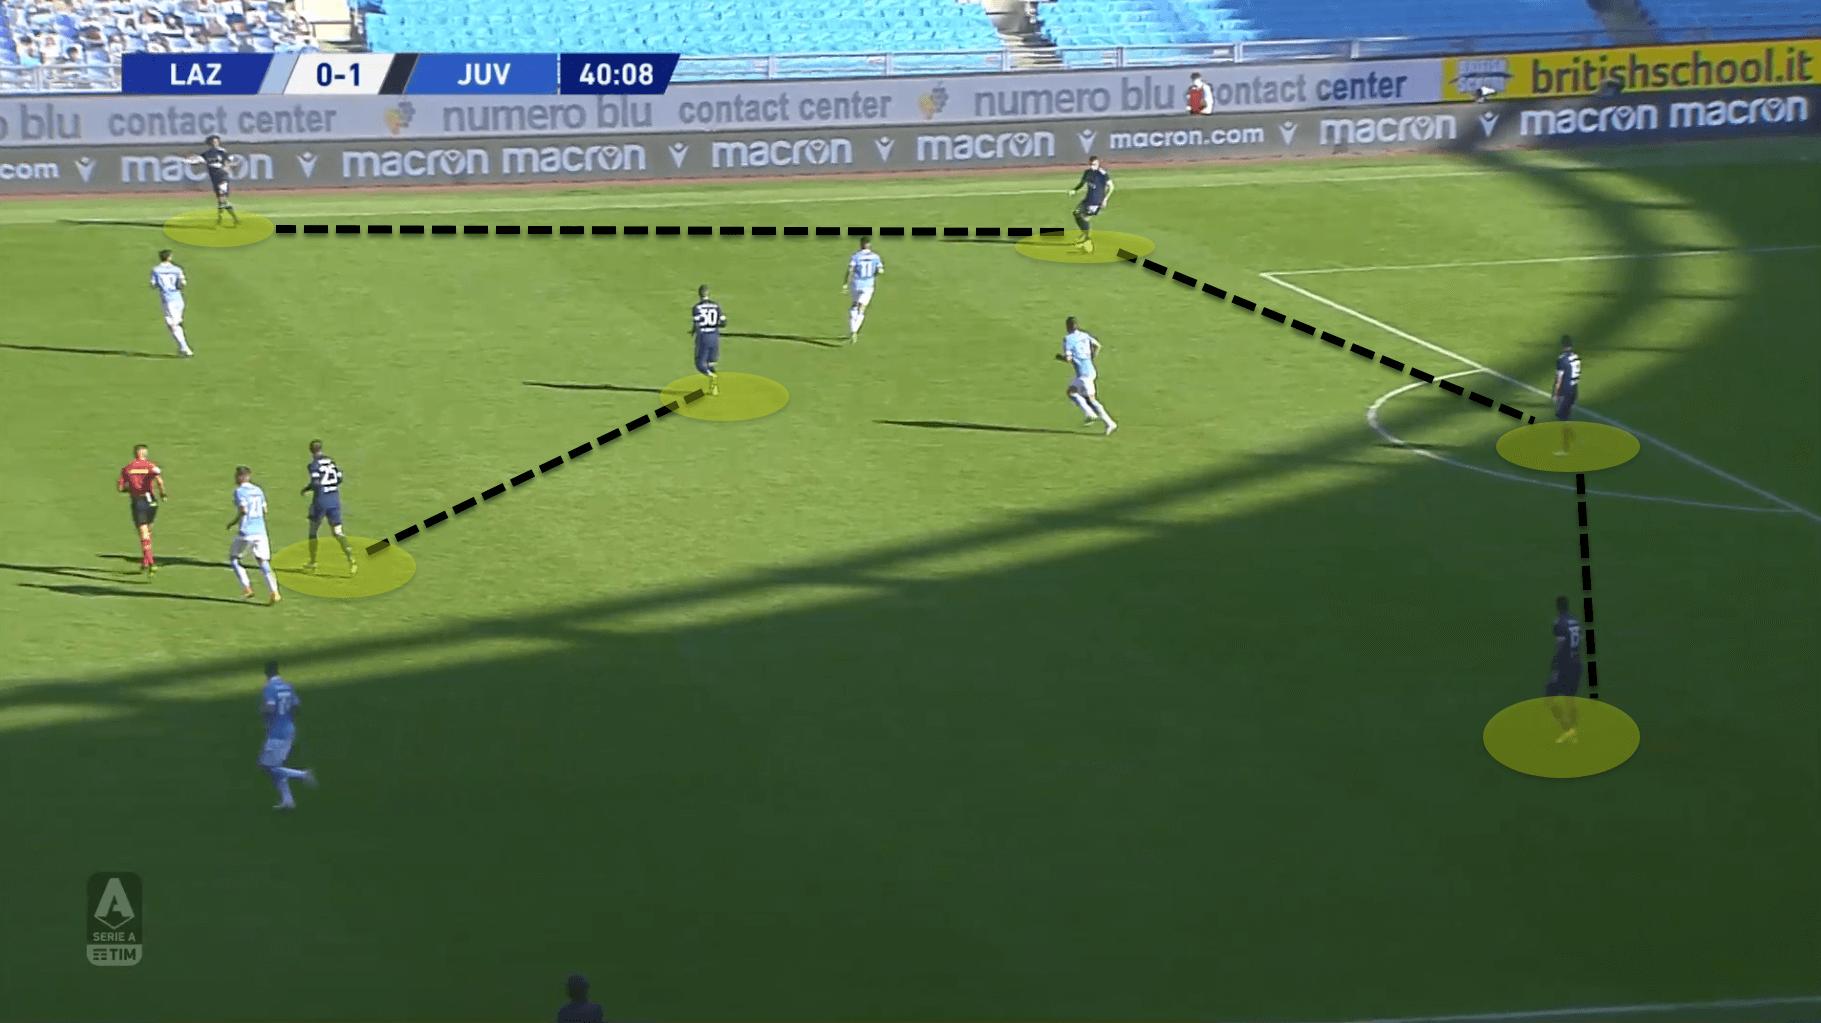 Serie A 2020/21: Lazio vs Juventus - tactical analysis tactics